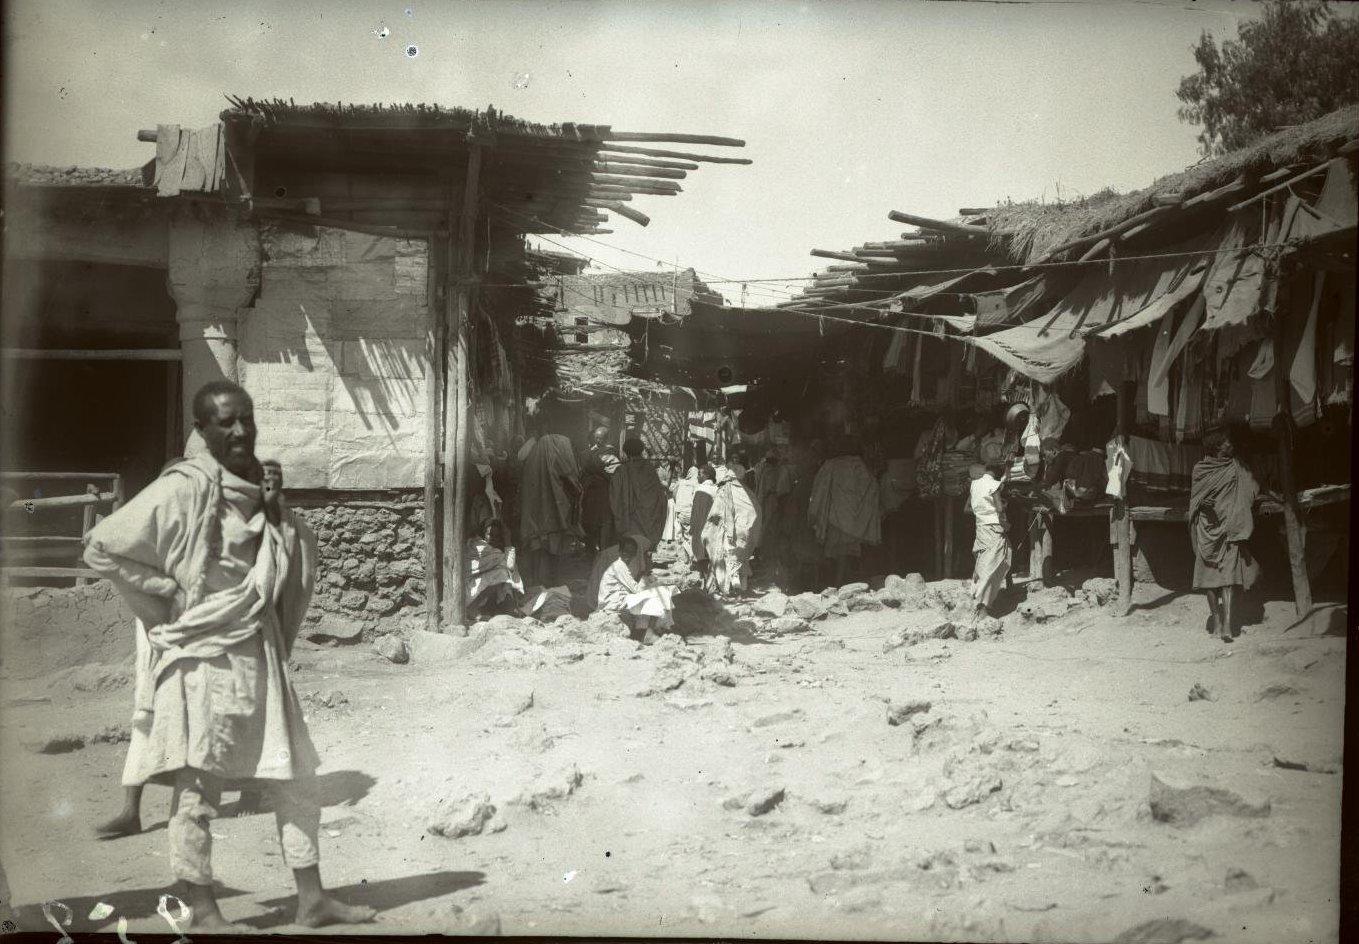 259. Абиссиния, провинция Харар, г. Харар. Базарная улица. Галла